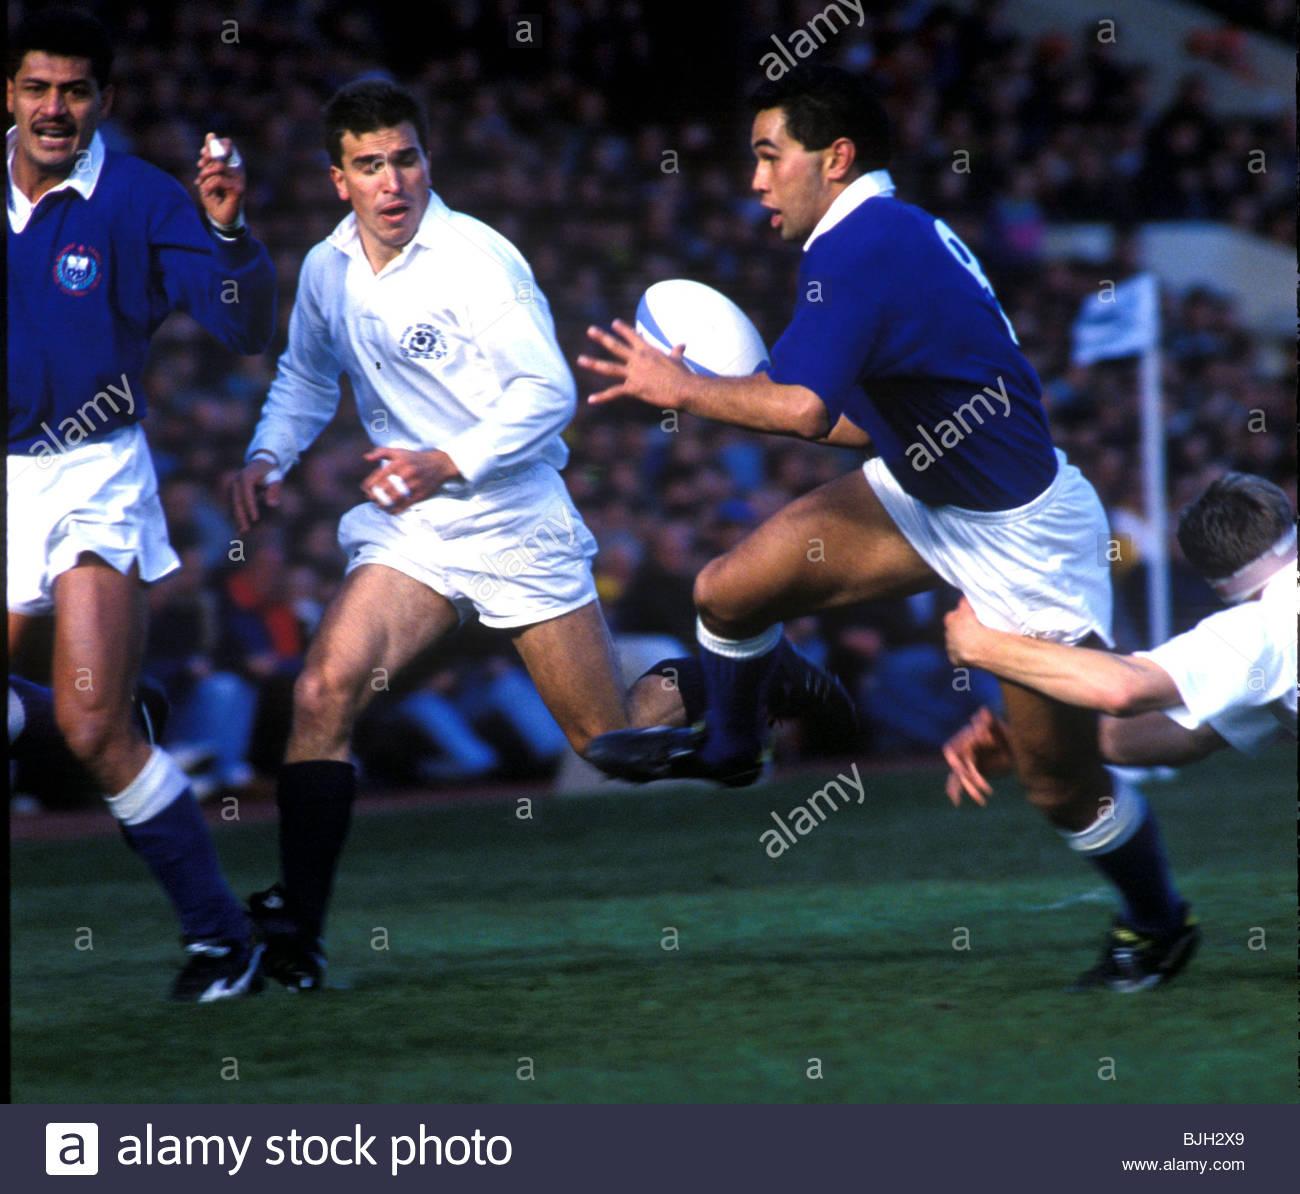 19/10/91 IRB RUGBY WORLD CUP 1991 QUARTER-FINAL SCOTLAND V WESTERN SAMOA (28-6) MURRAYFIELD - EDINBURGH Lima charges - Stock Image